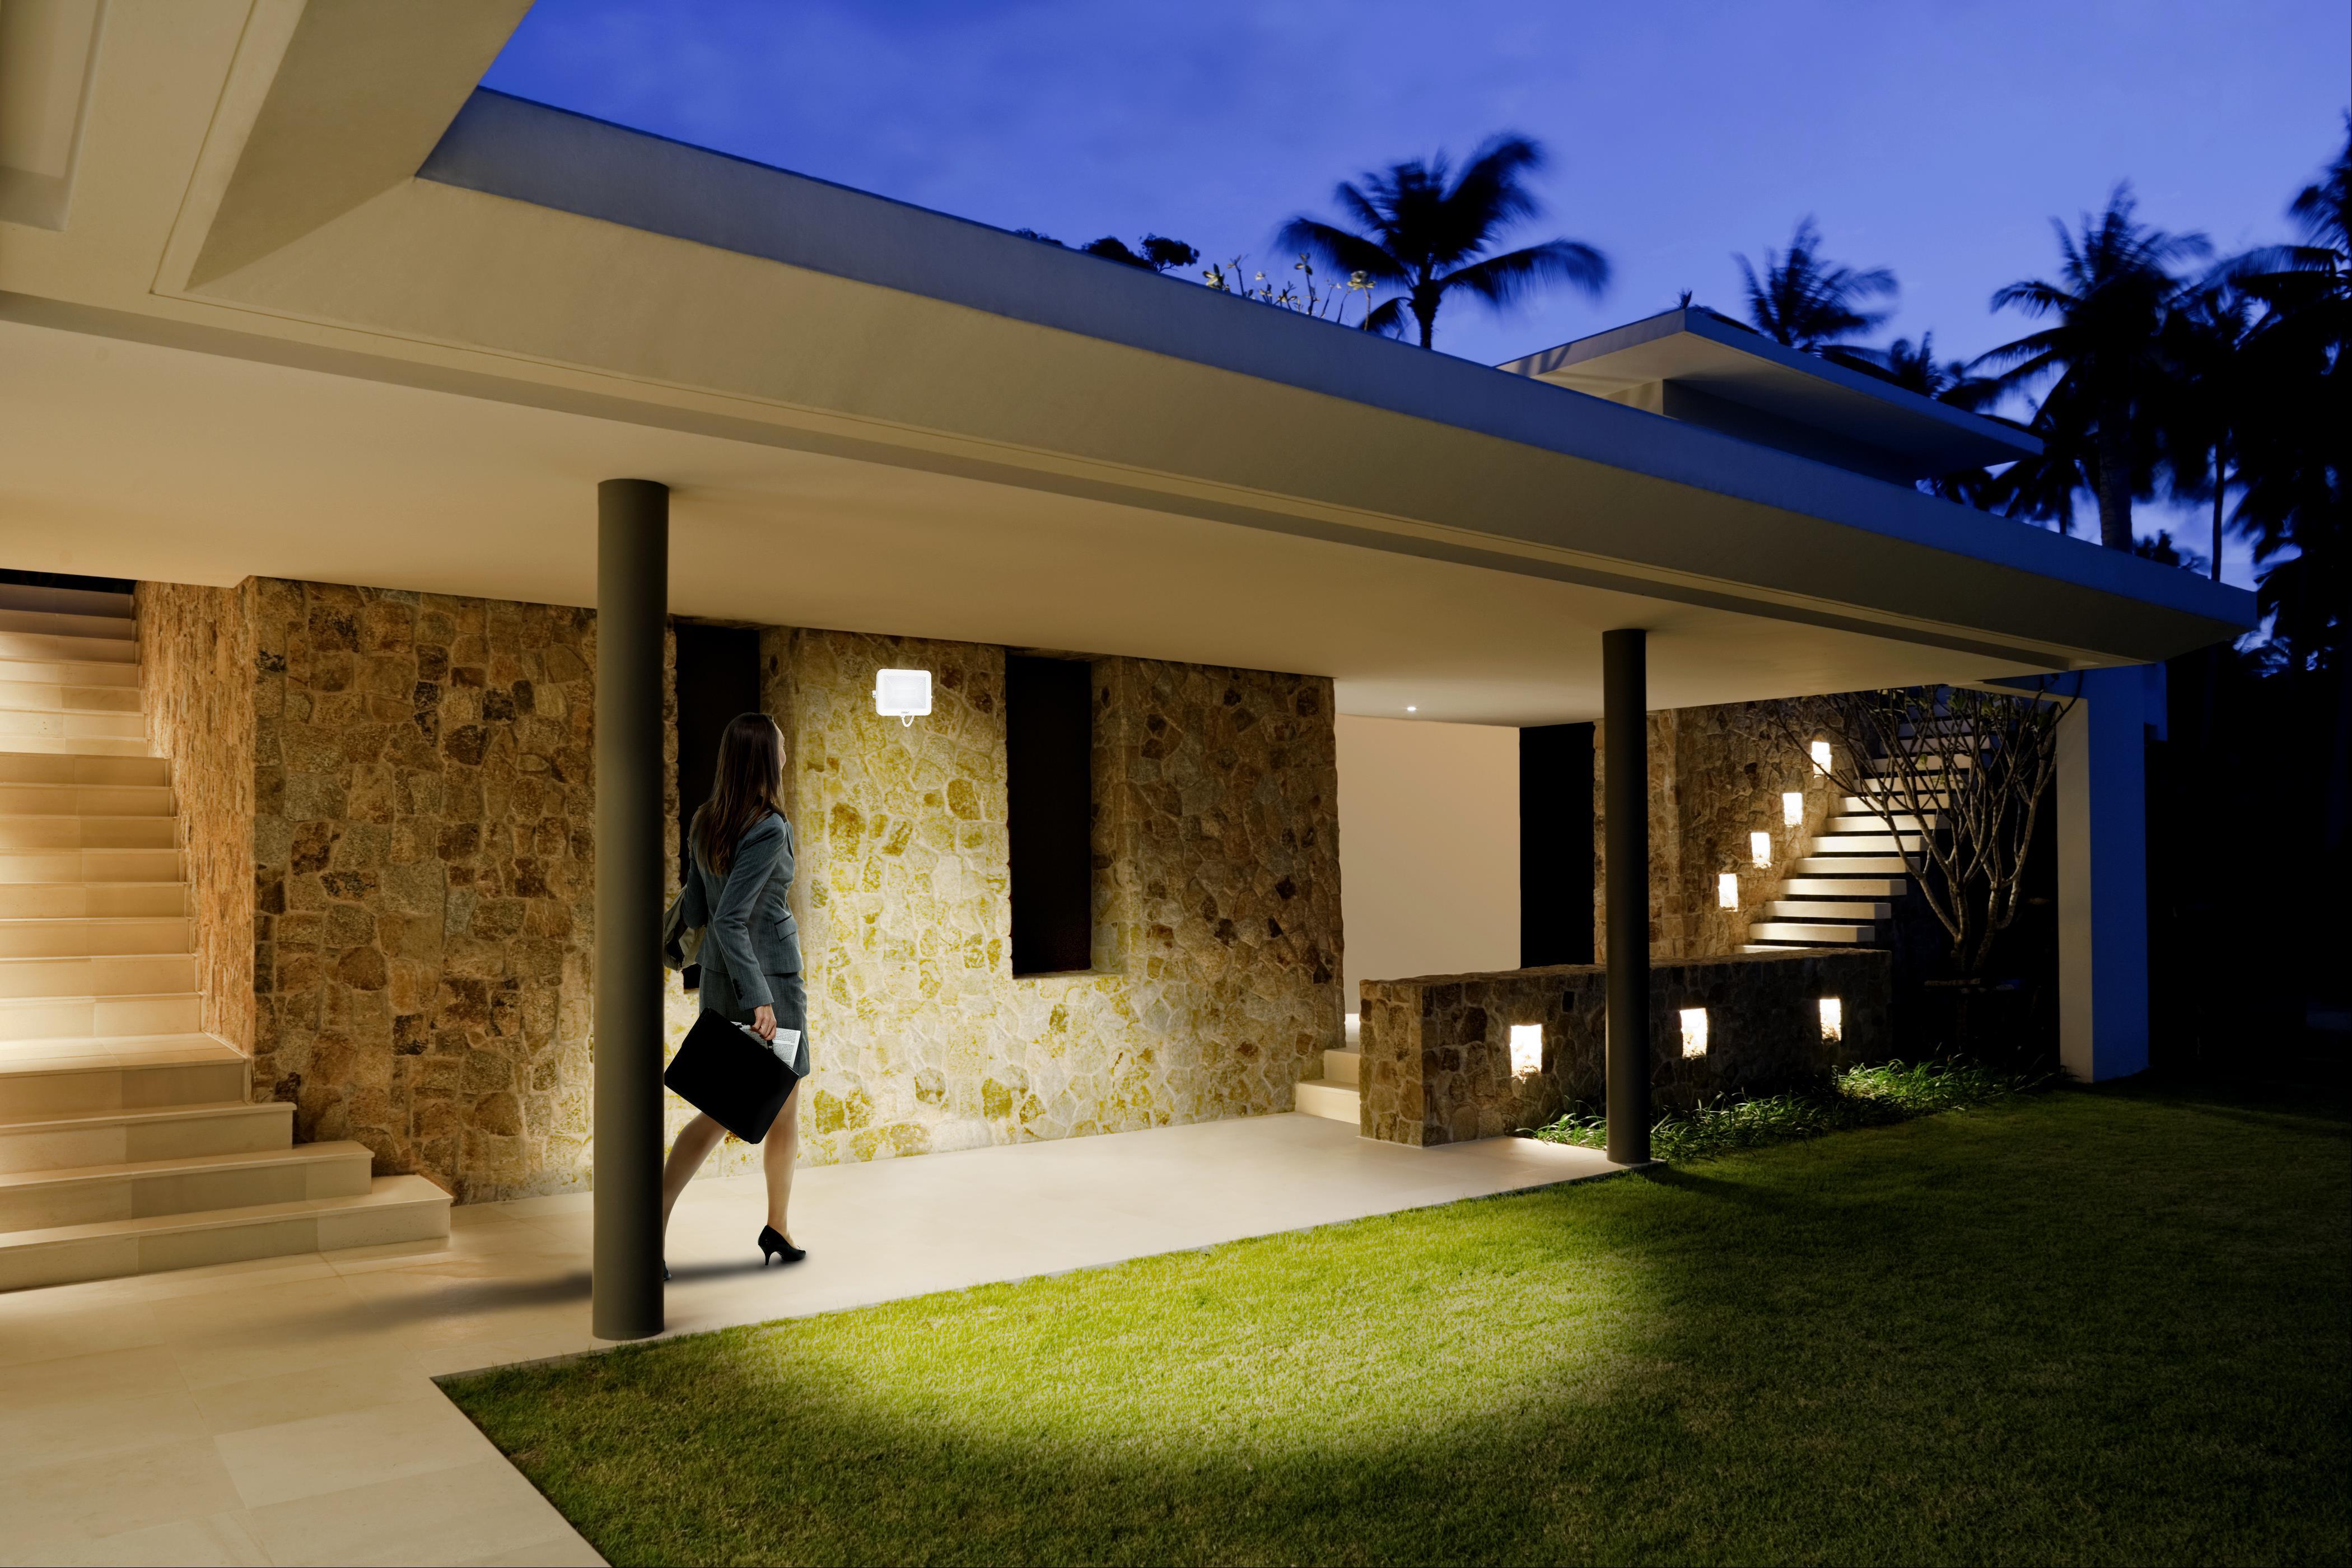 flat led strahler lls18754 wei 30 watt bei. Black Bedroom Furniture Sets. Home Design Ideas